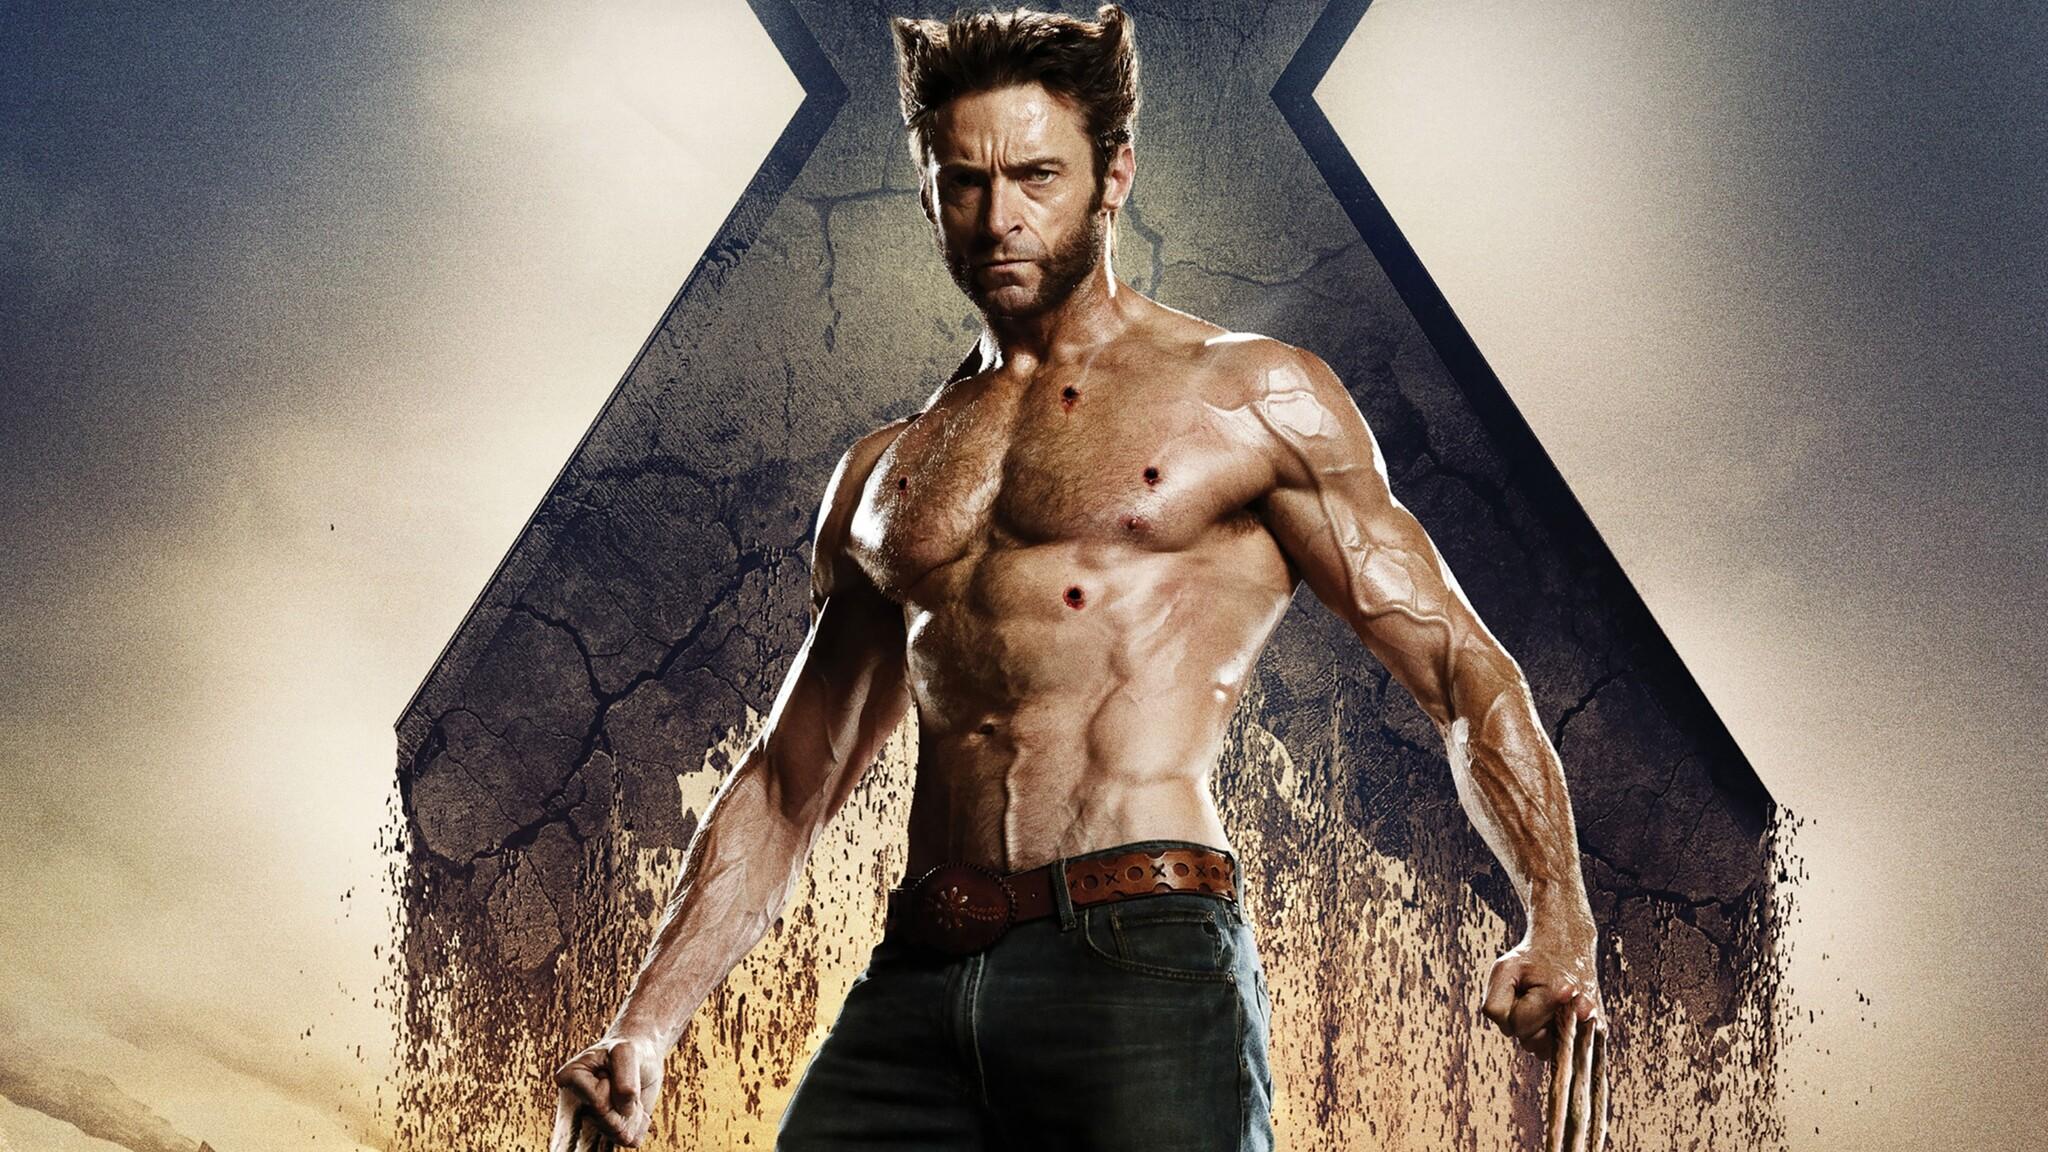 2048x1152 Wolverine In X Men 2048x1152 Resolution Hd 4k Wallpapers